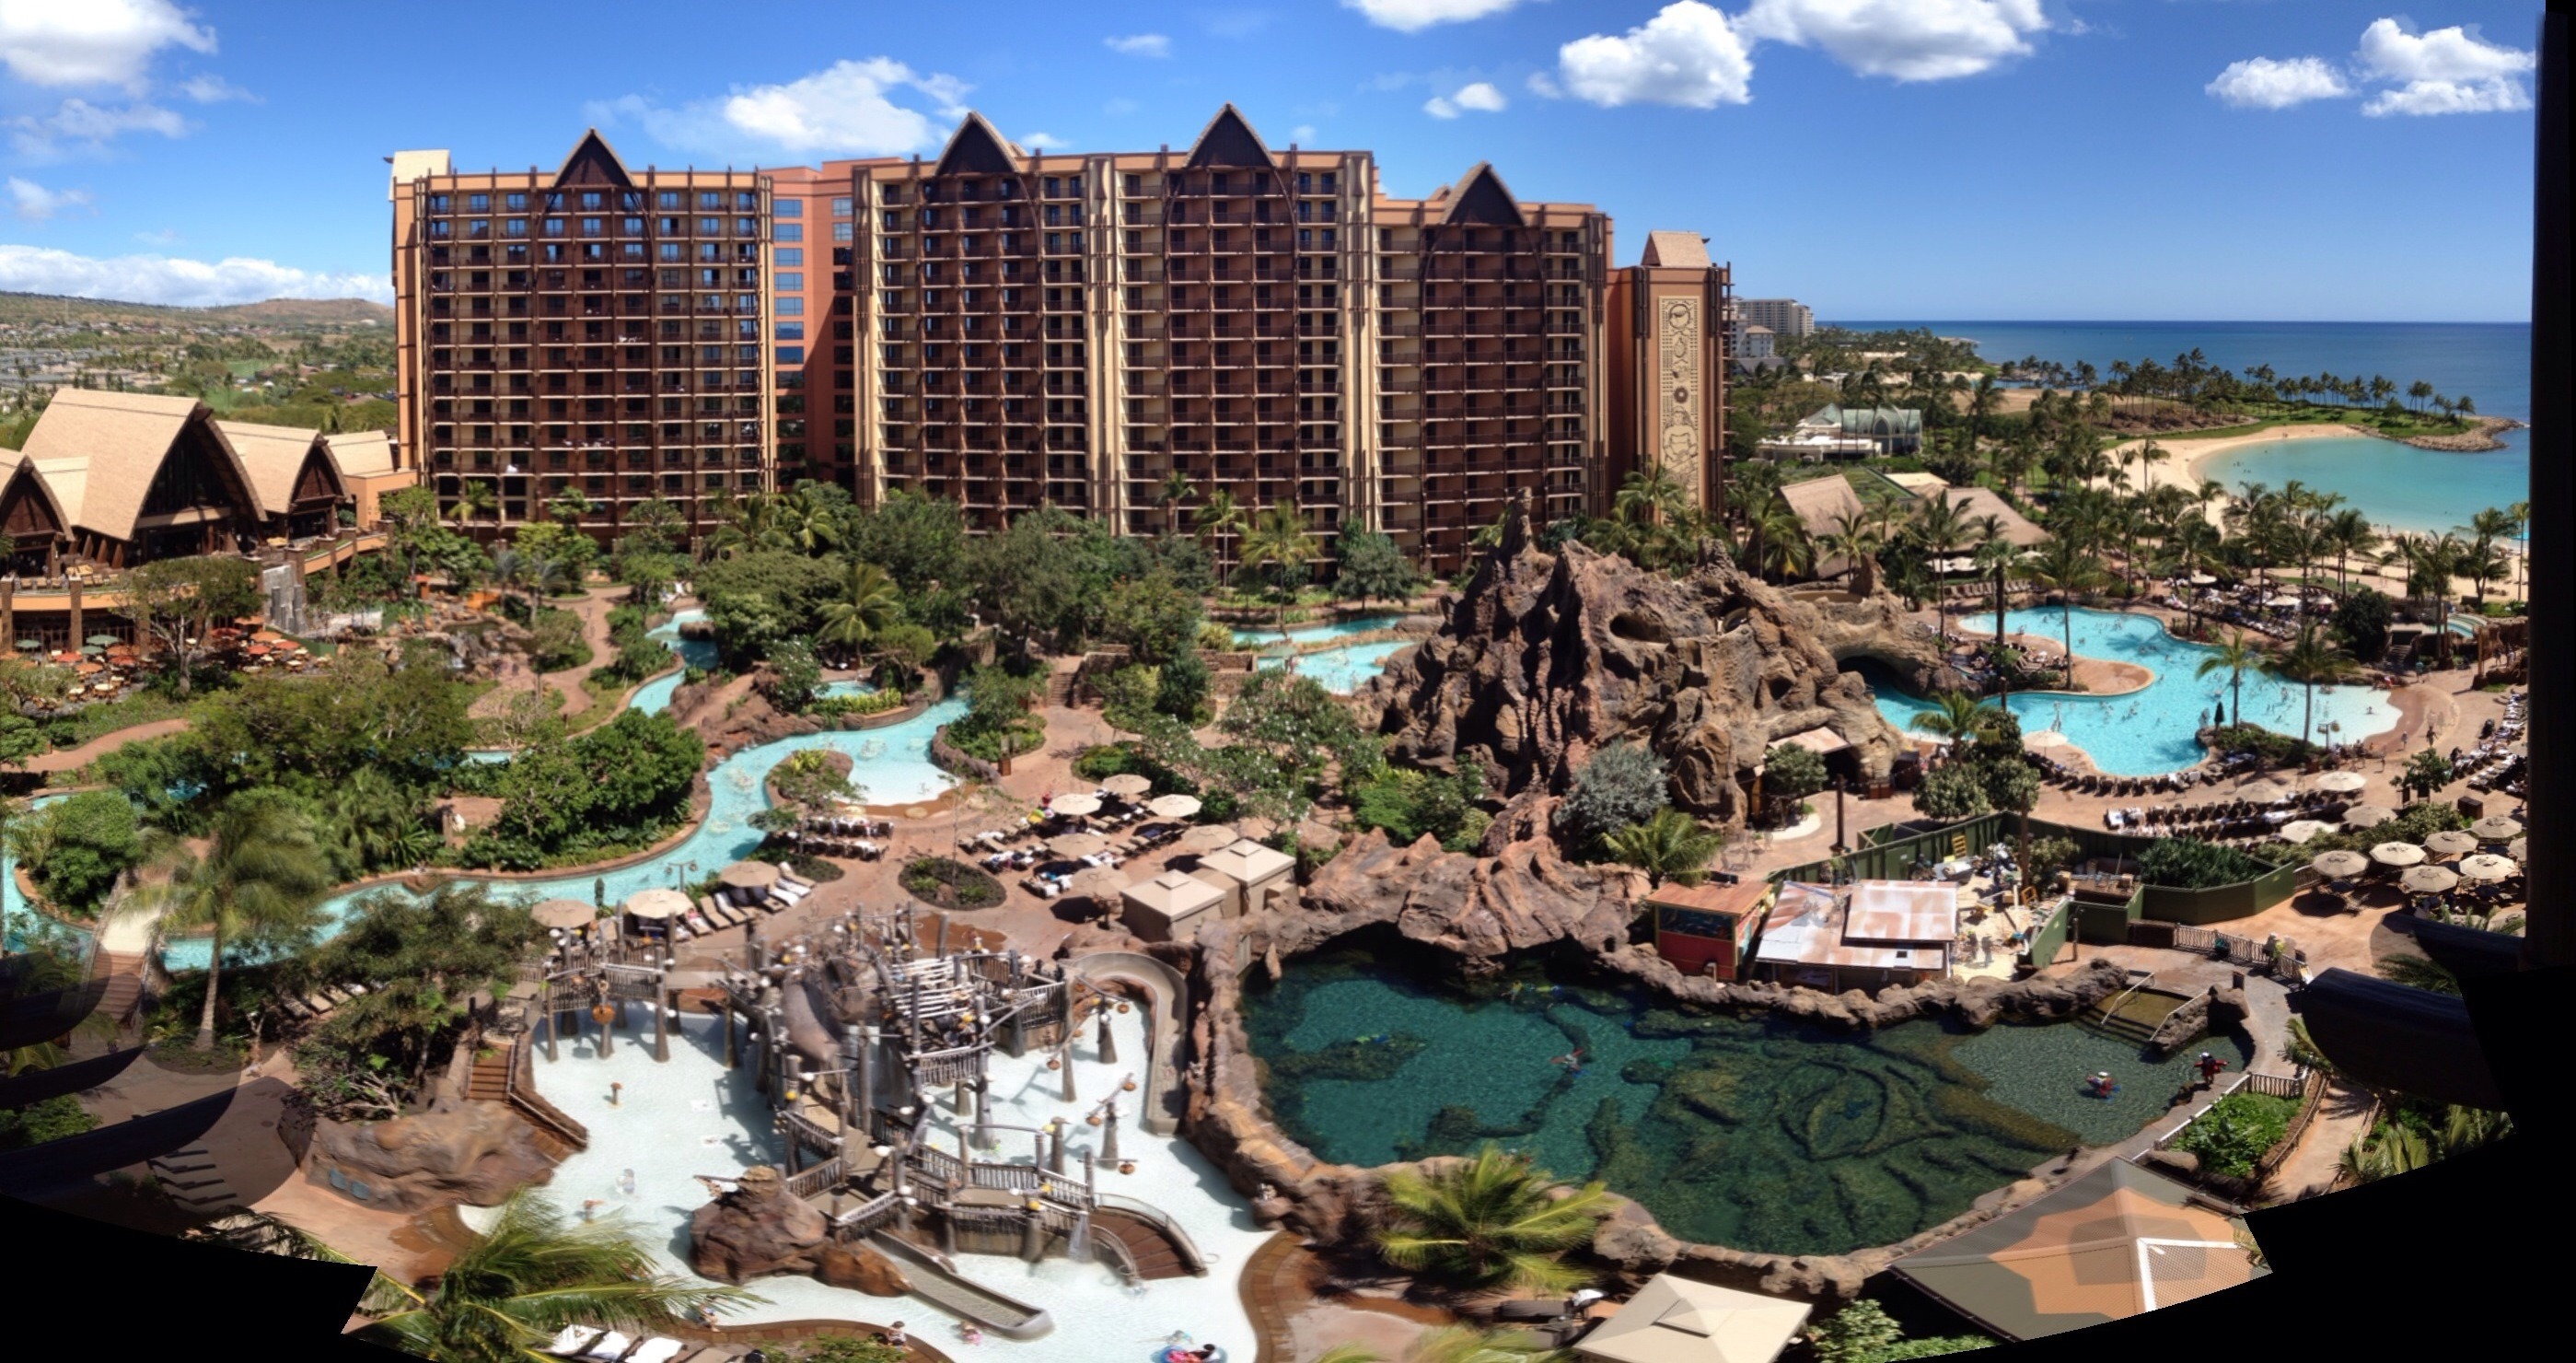 most expensive resort ever built may come to hawaii | hawaii aloha